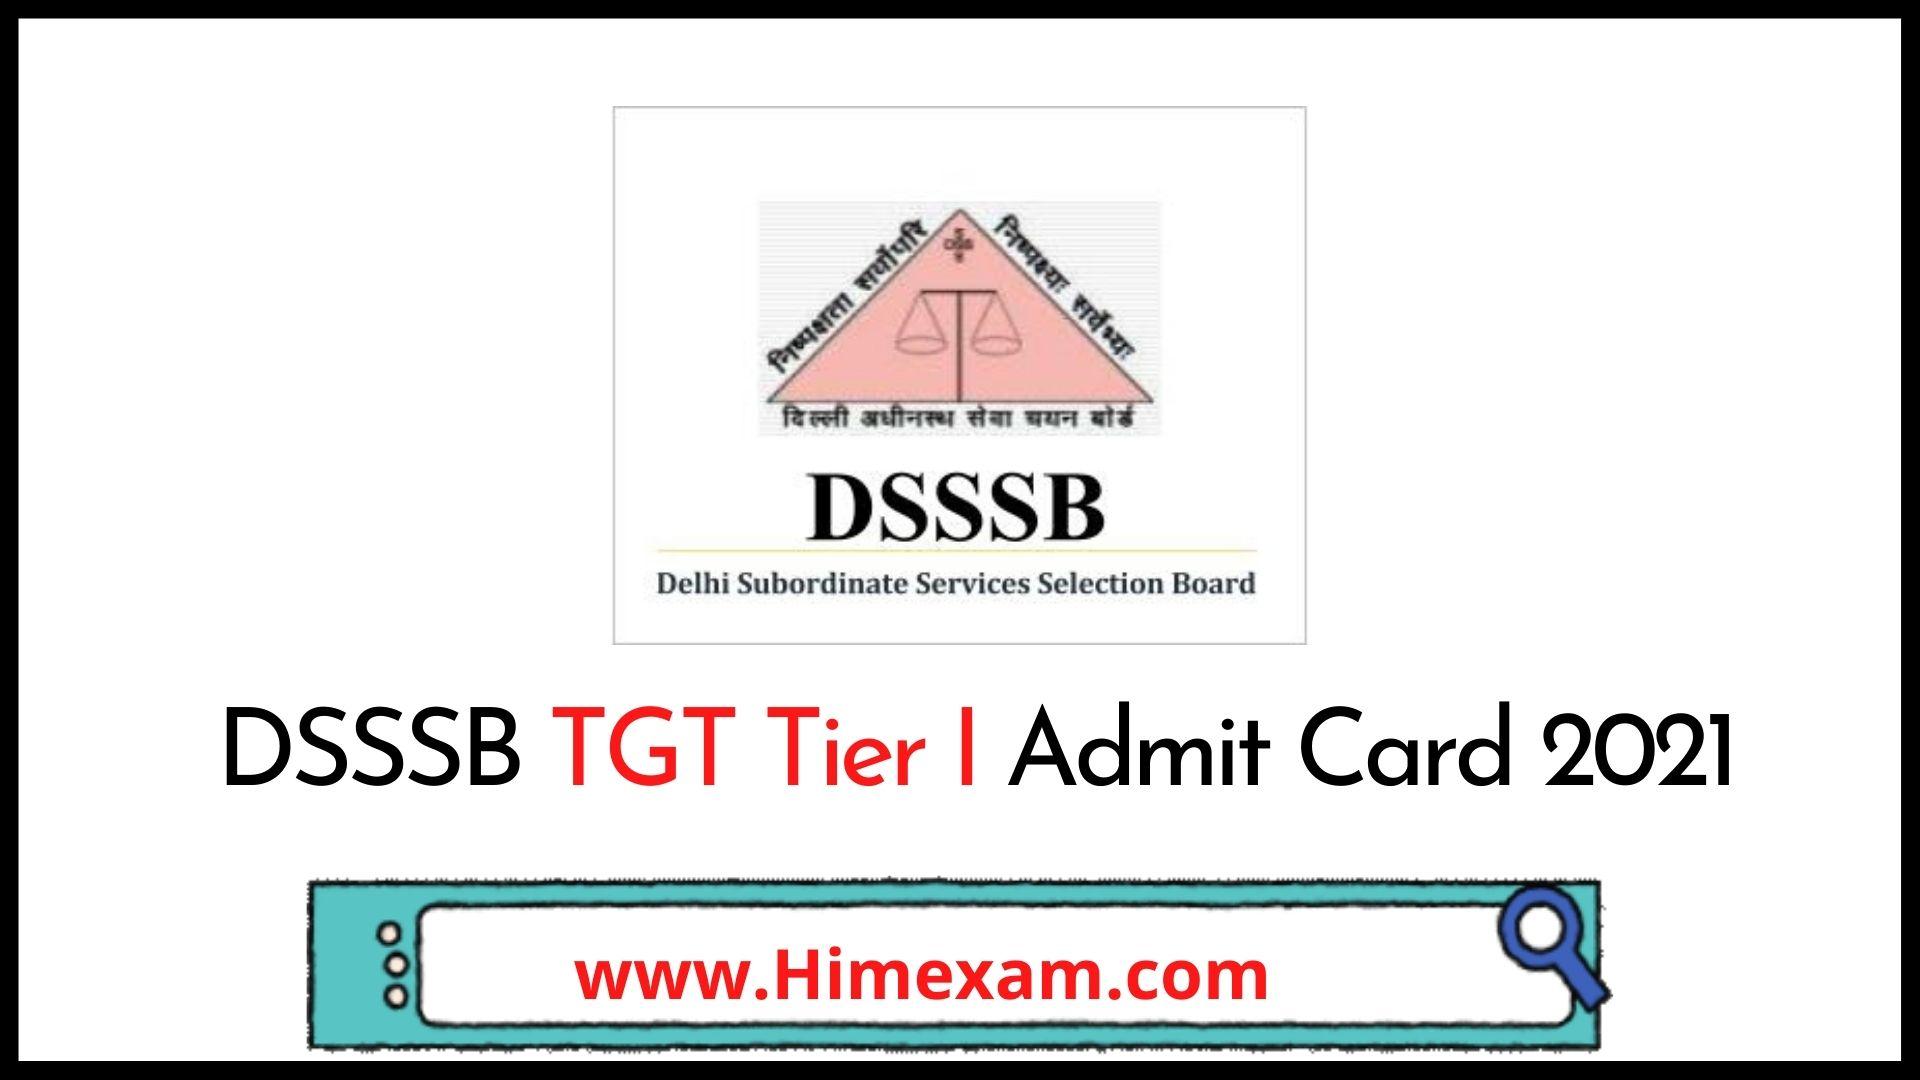 DSSSB TGT Tier I Admit Card 2021